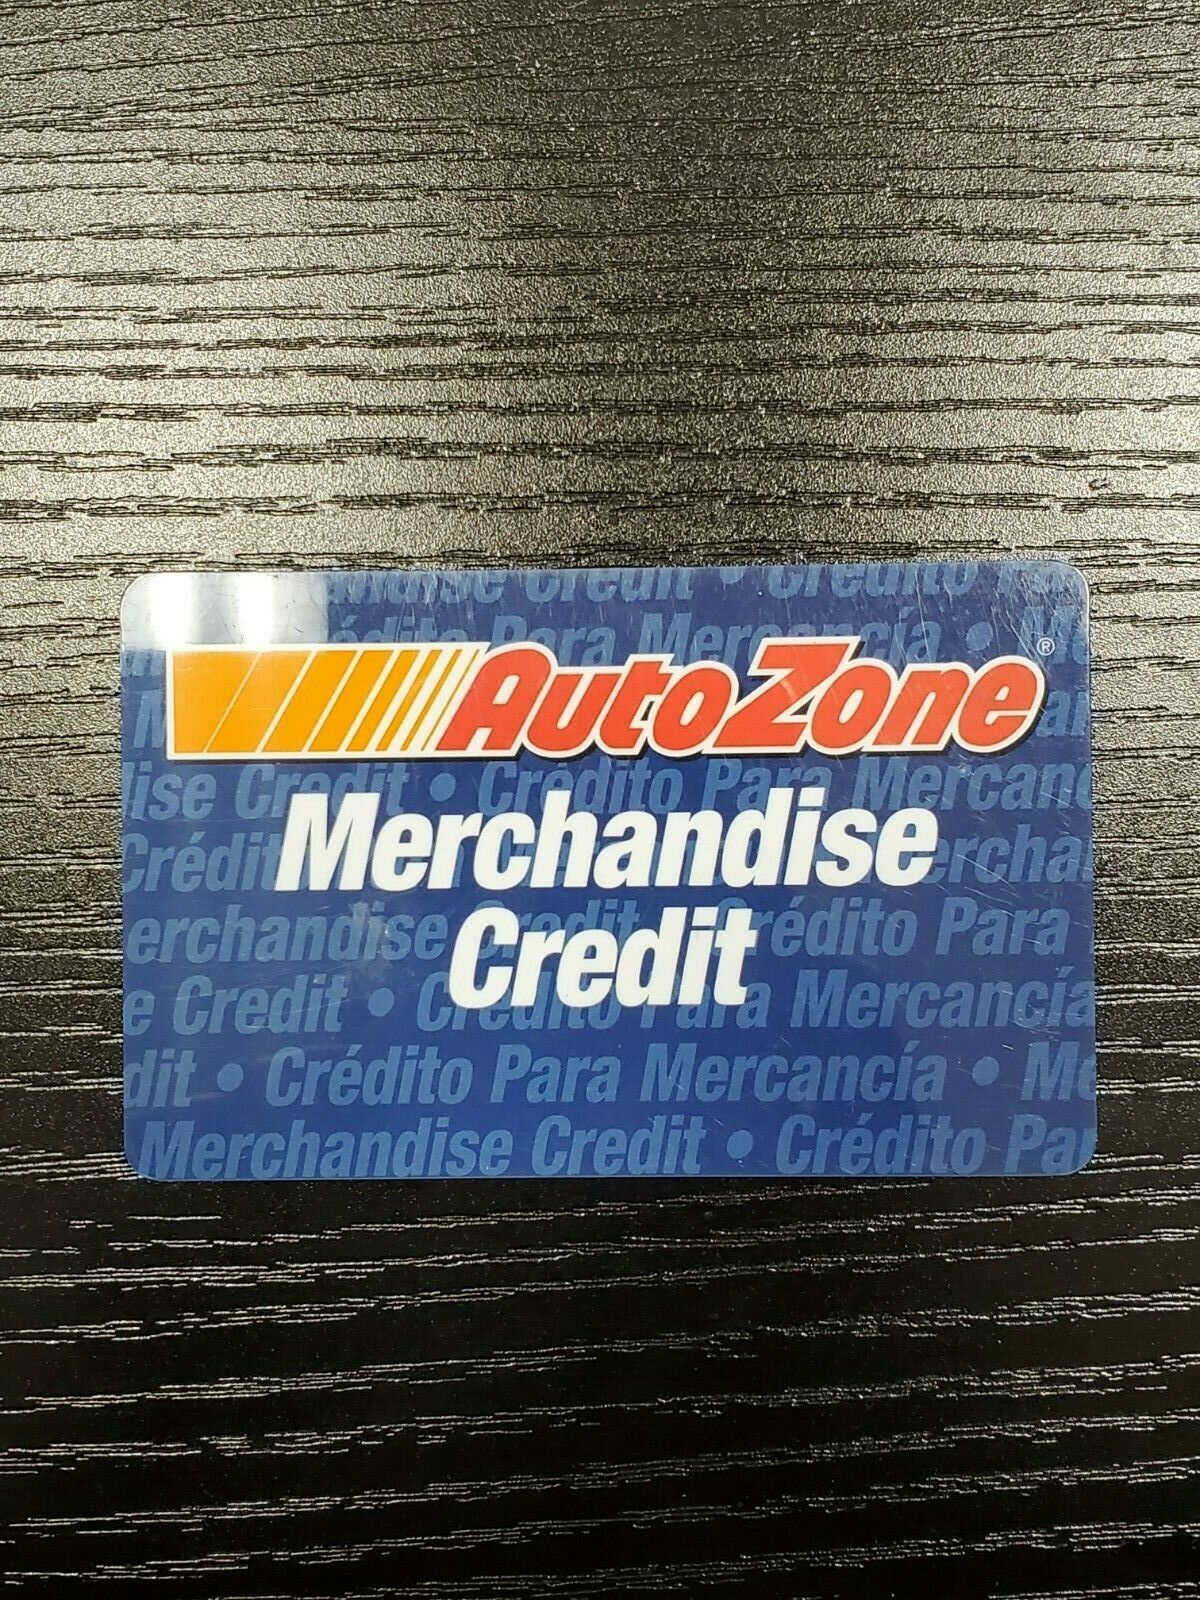 AUTOZONE MERCHANDISE CREDIT GIFT CARD 126.43 - $94.82